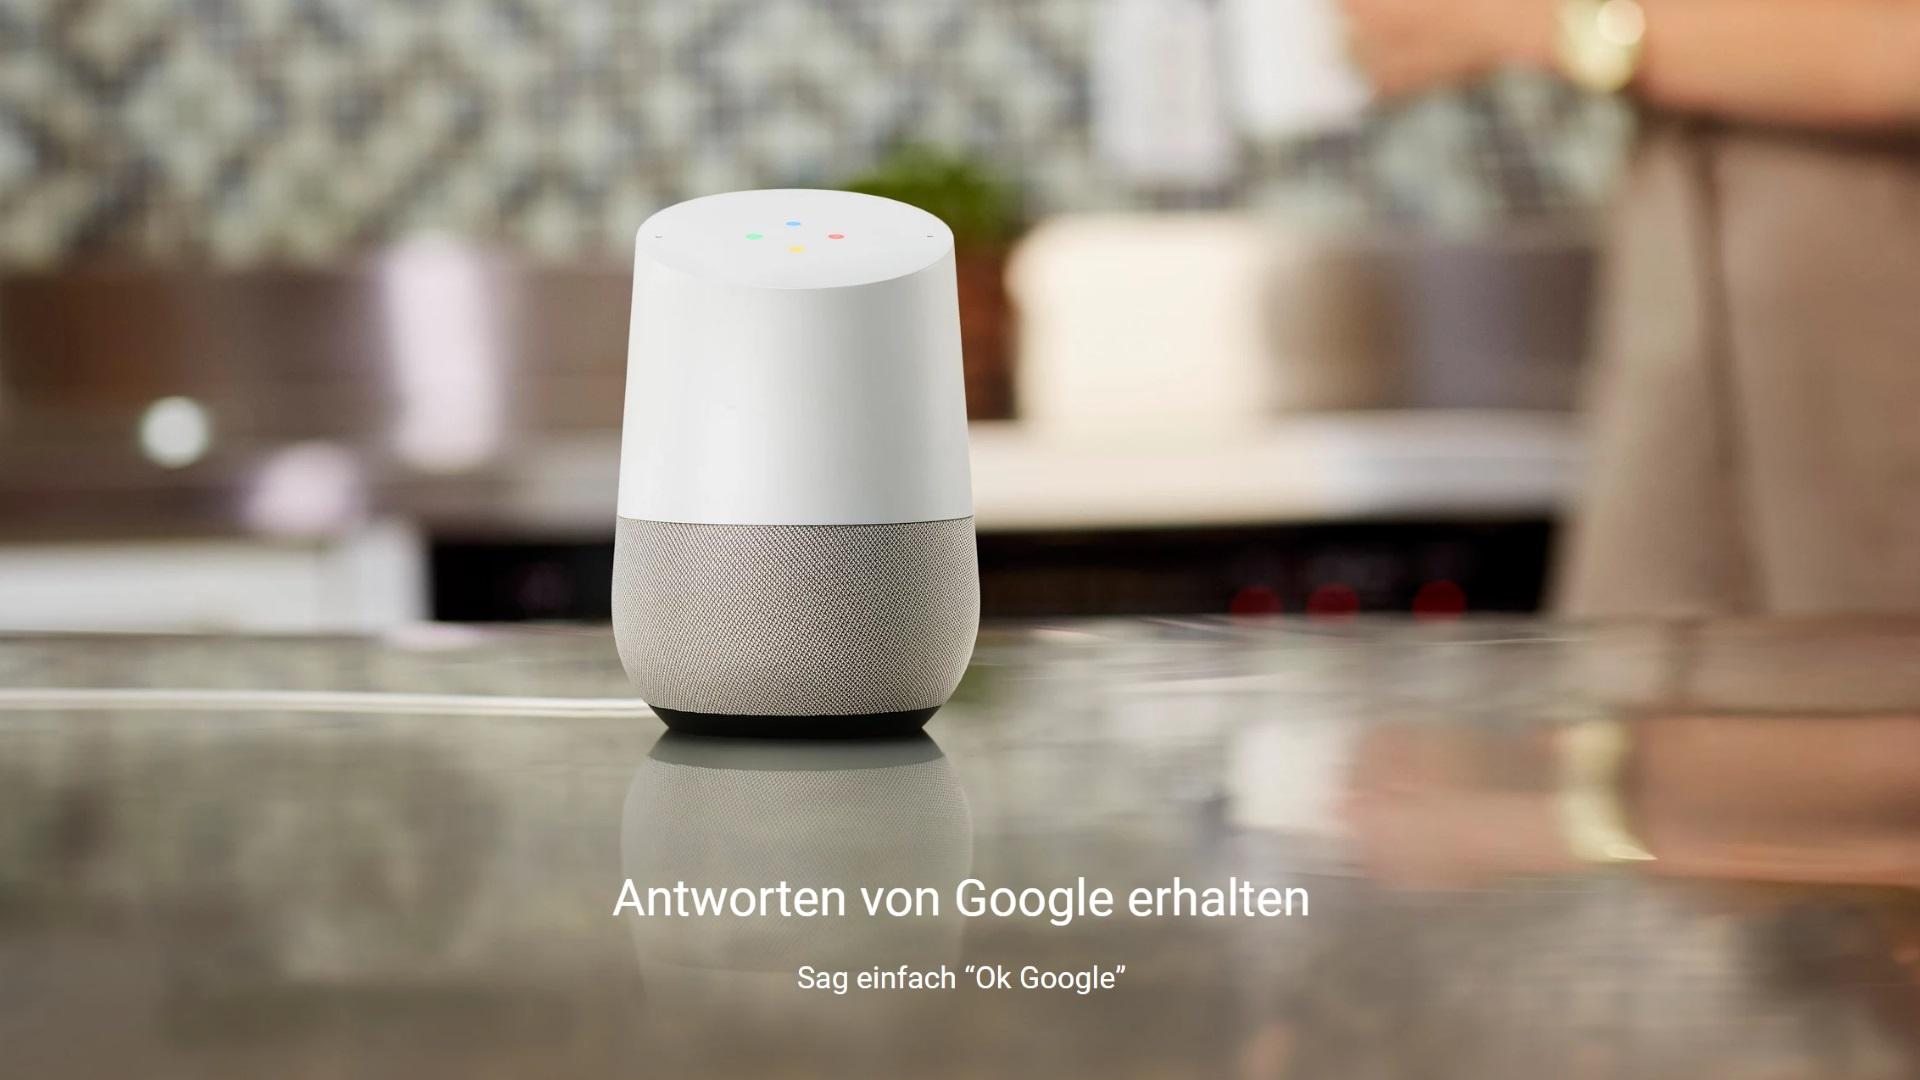 「Google Home」ドイツで発売、残るは日本